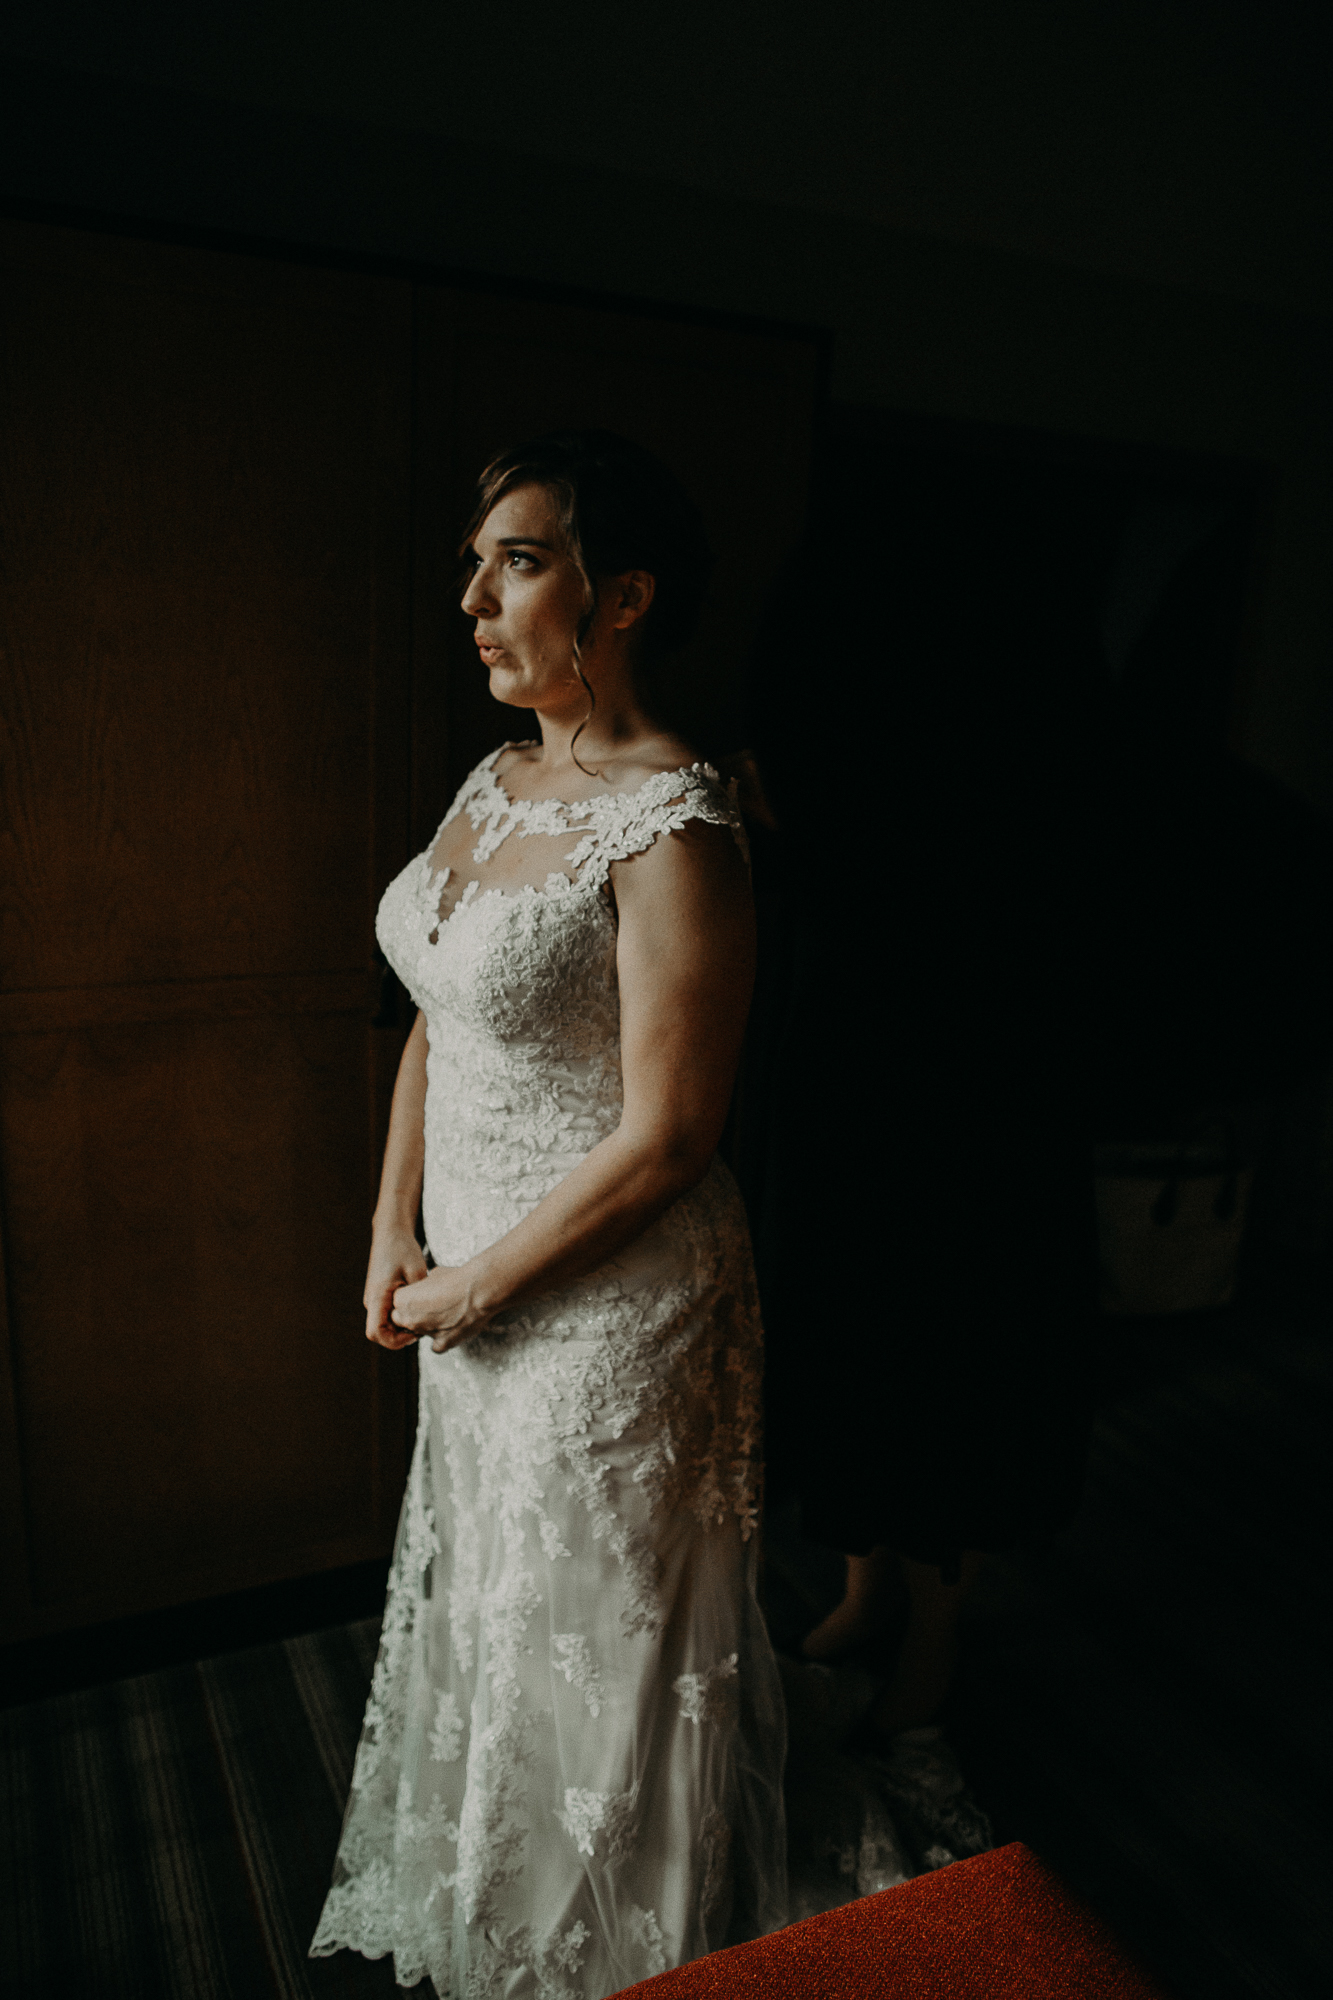 georgia_mountains_wedding_atlanta_photography-2.JPG